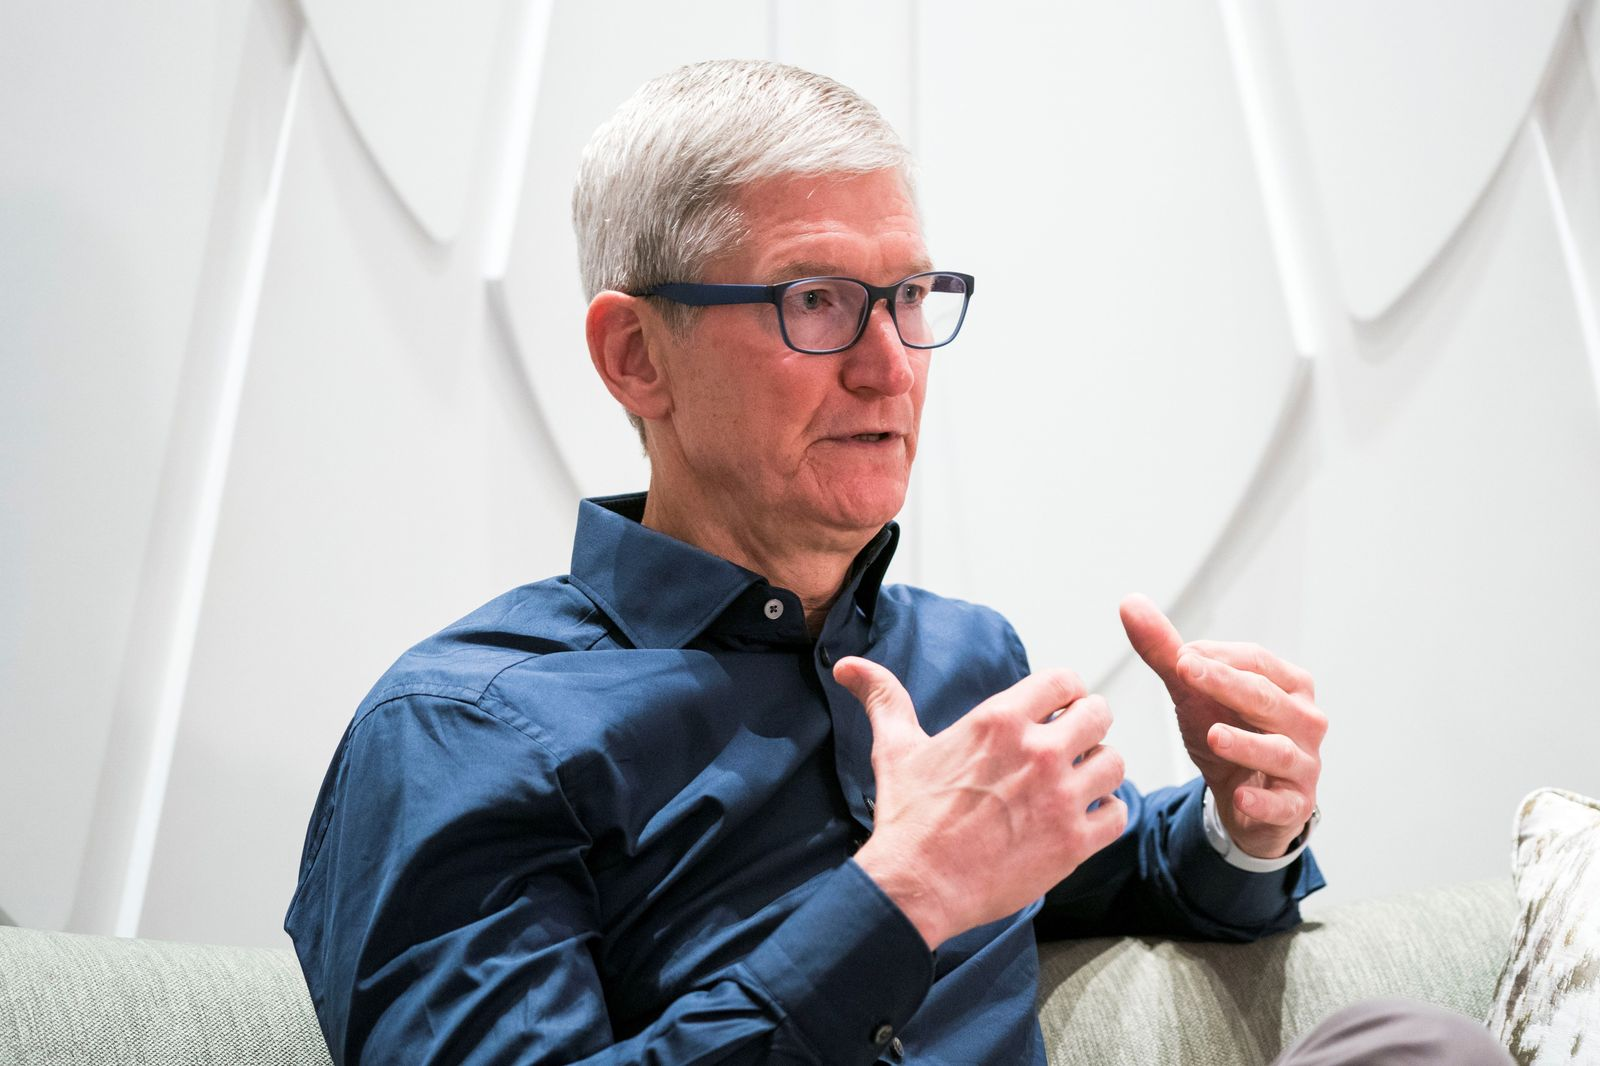 Apple/ Tim Cook